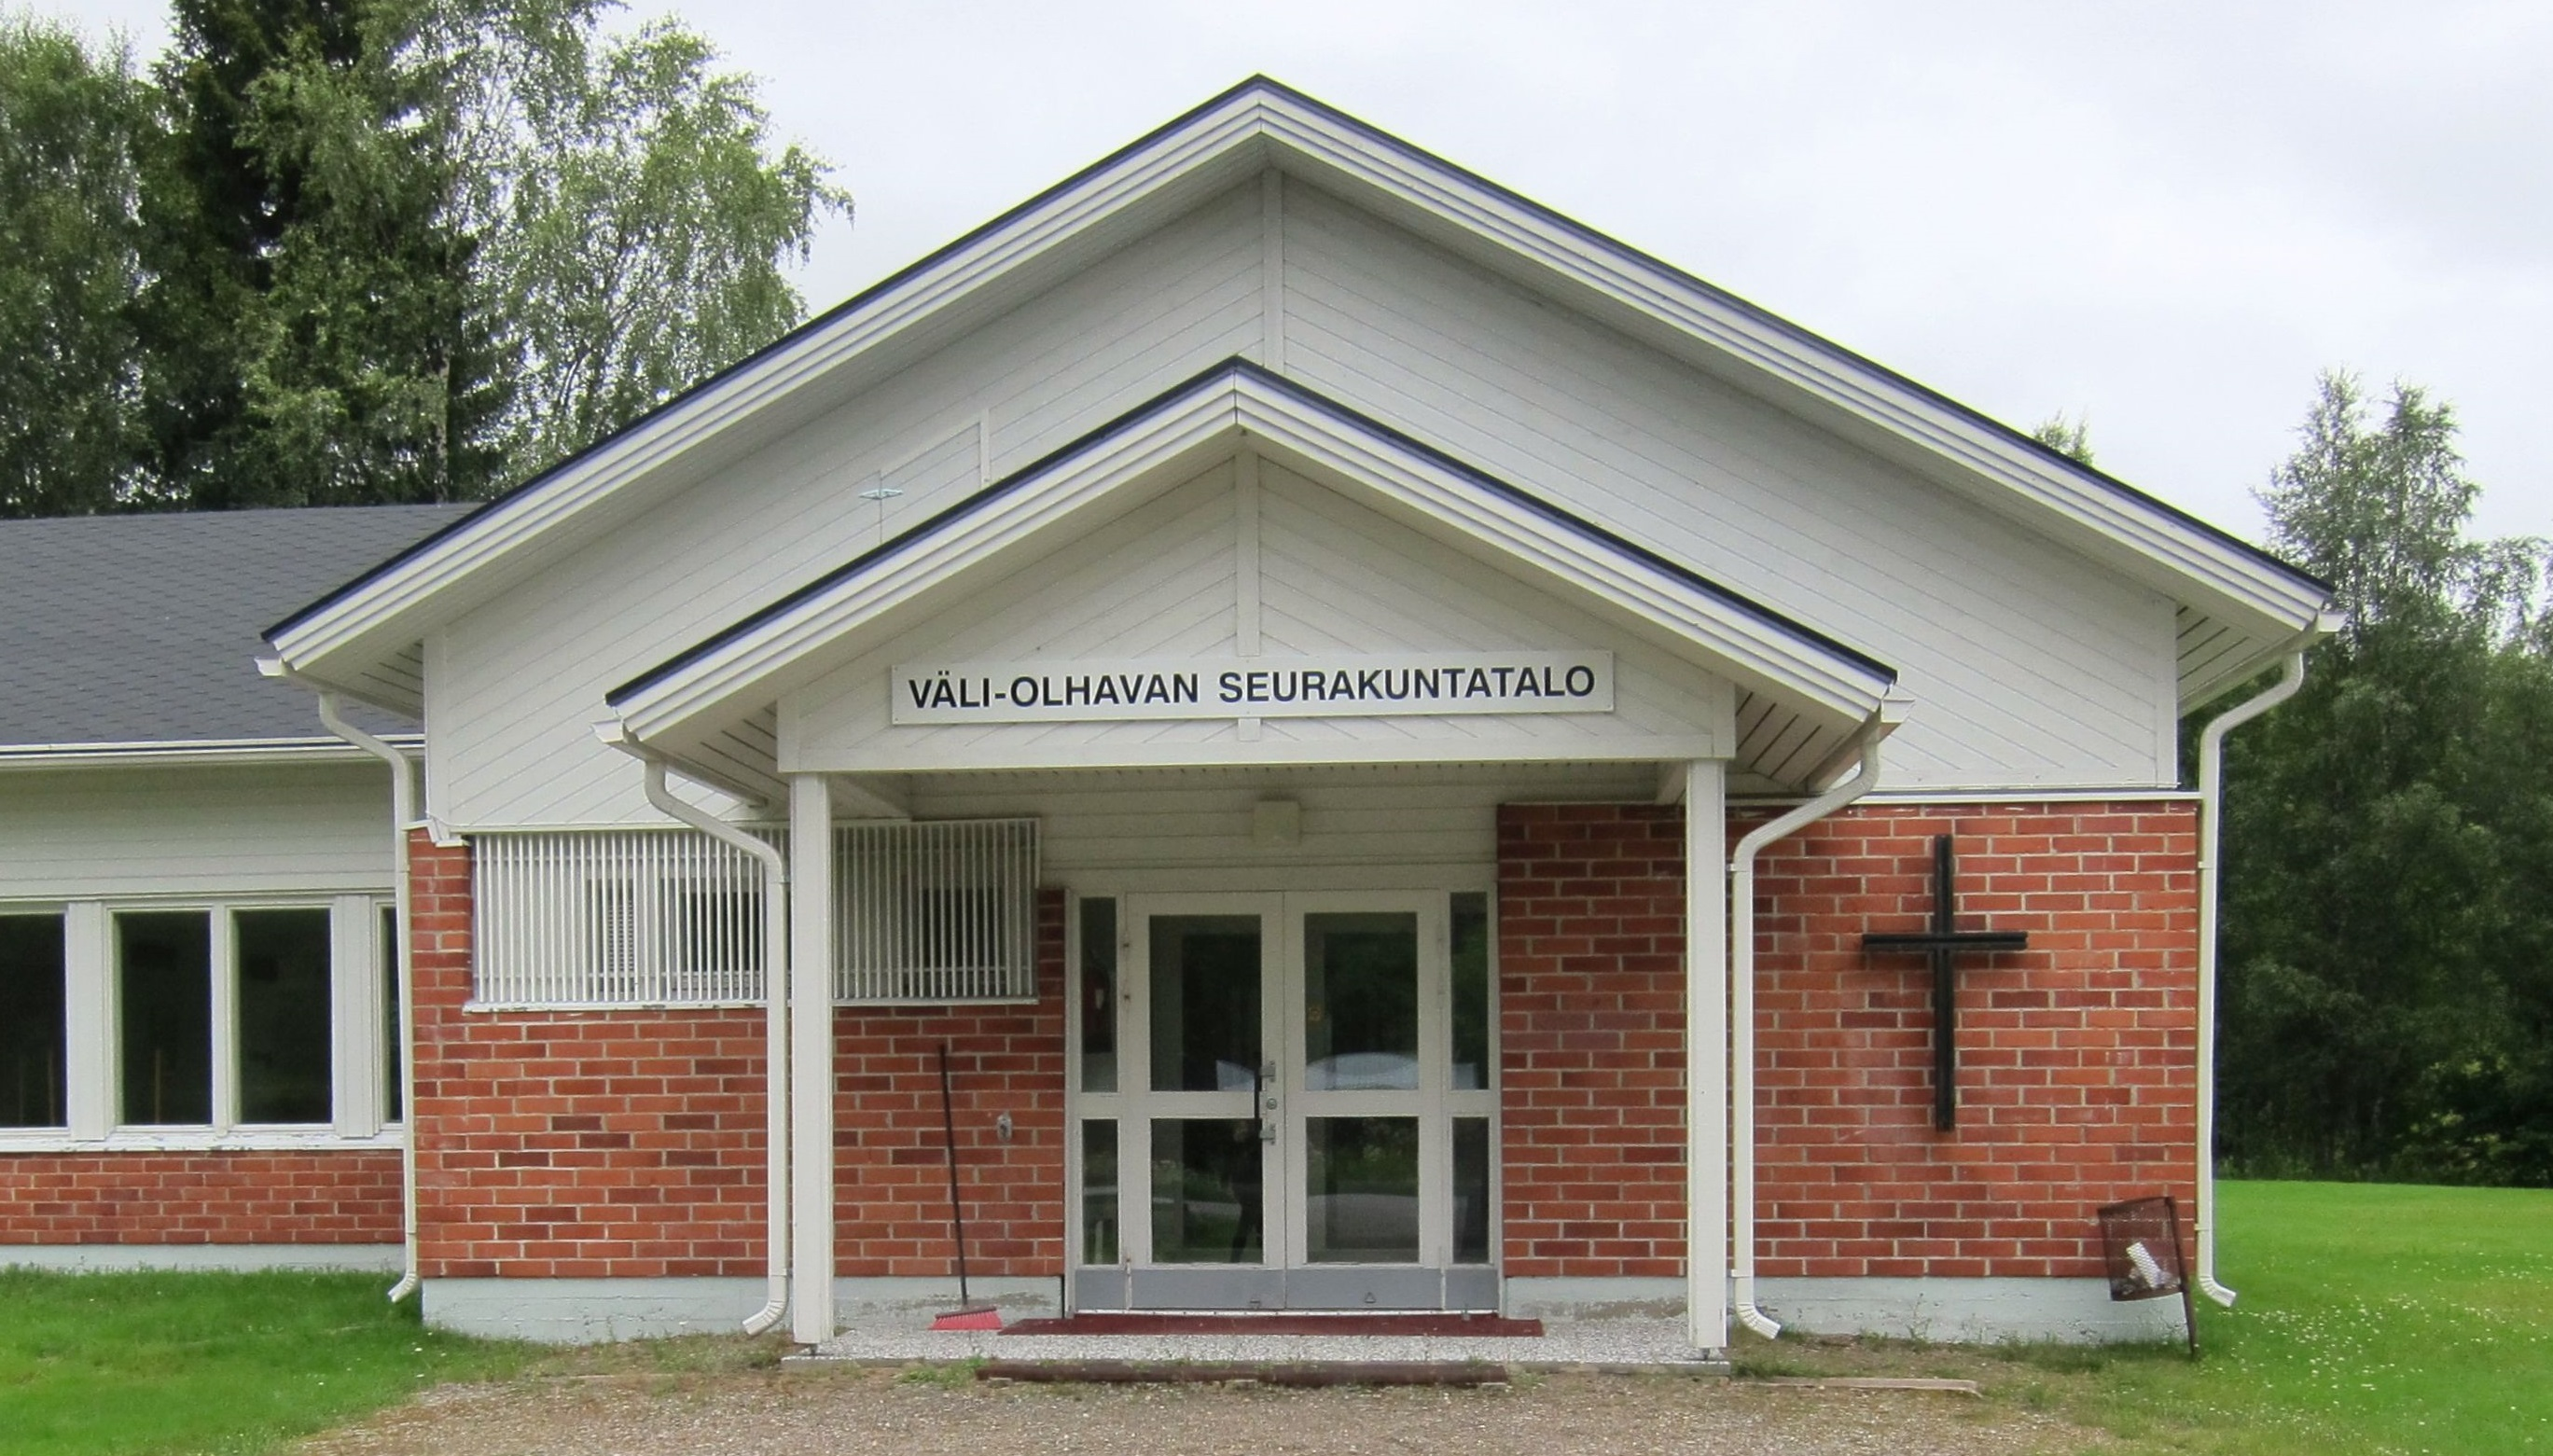 Väli-Olhavan seurakuntatalo